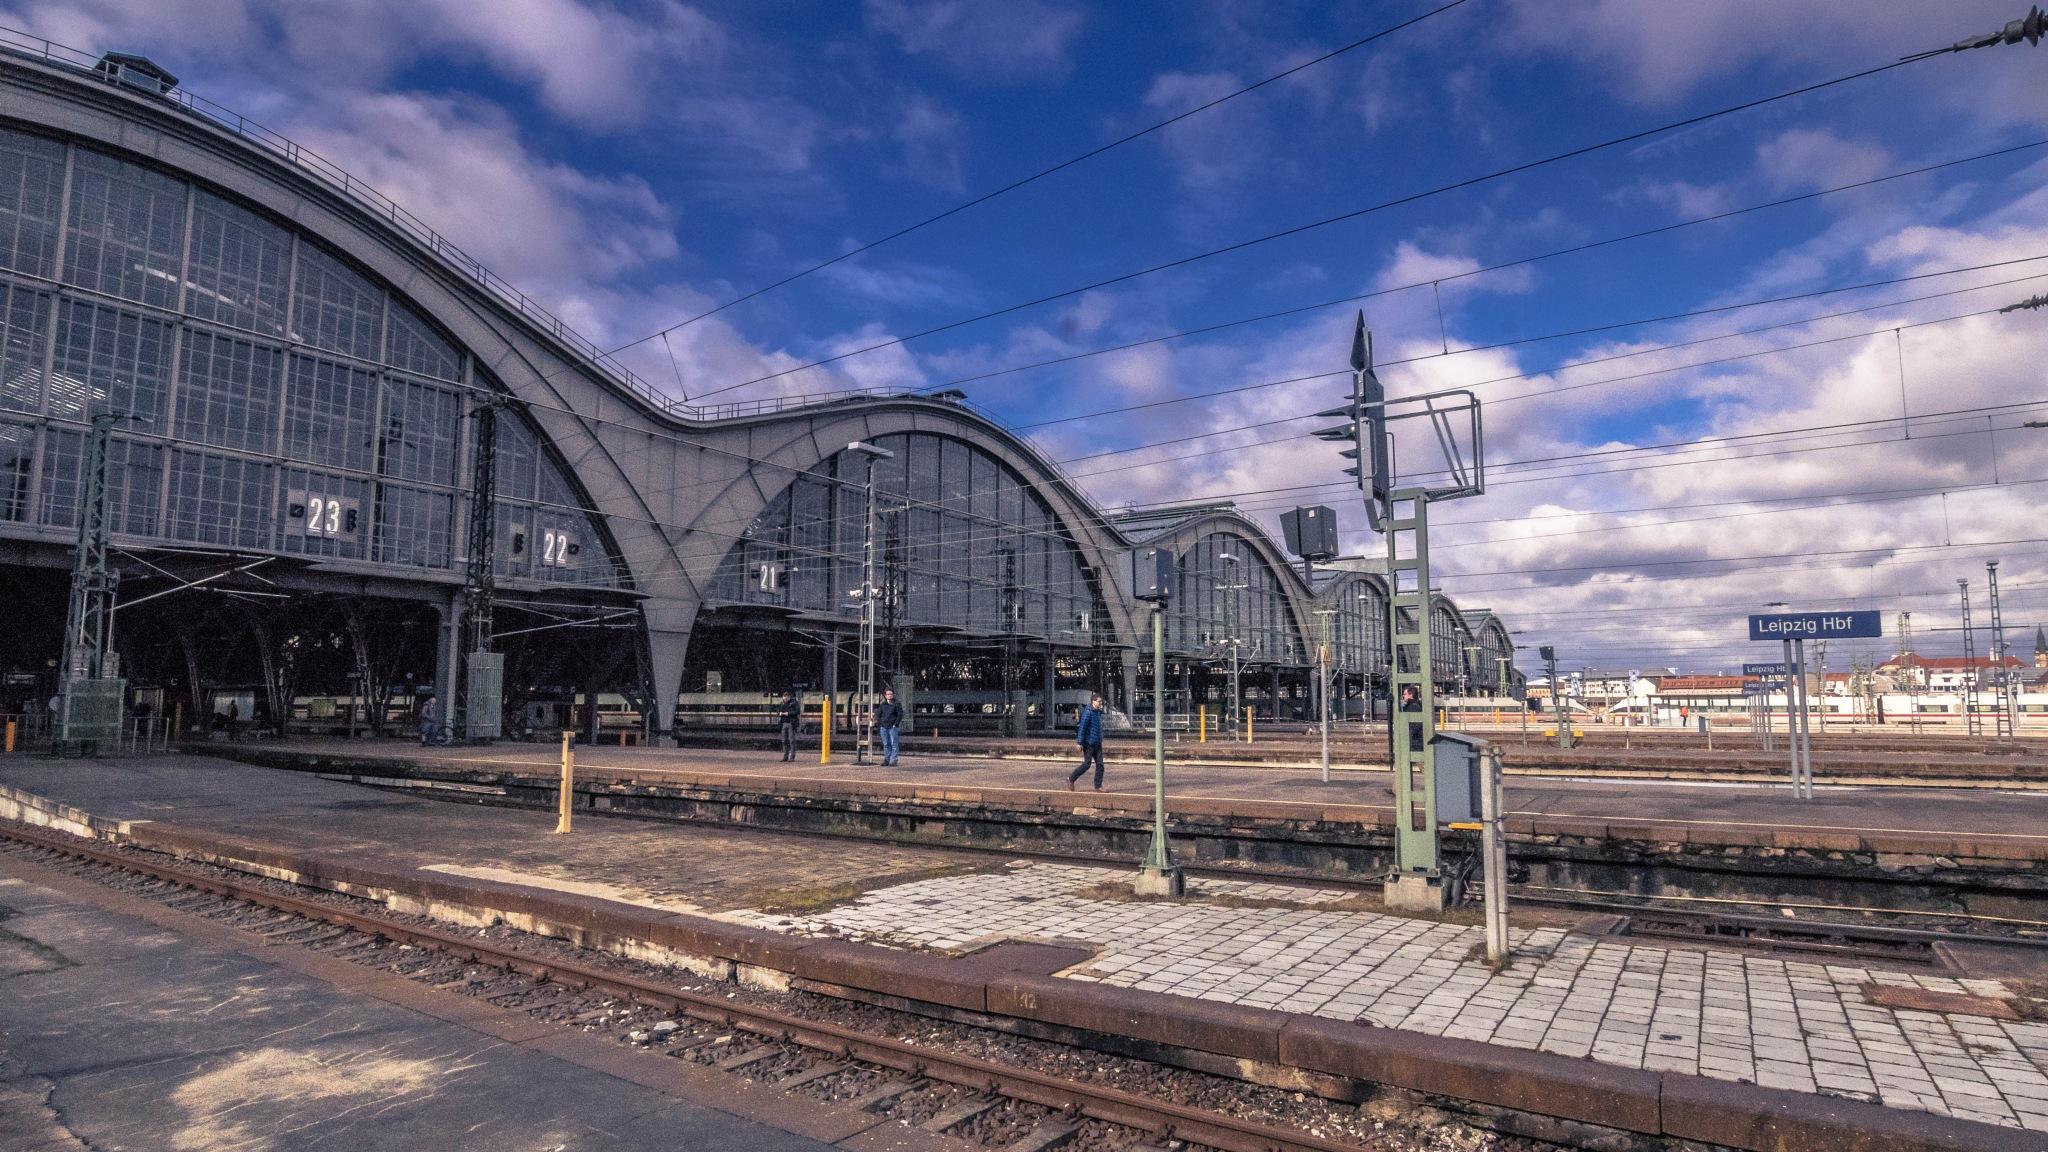 train station by Walter W. Price